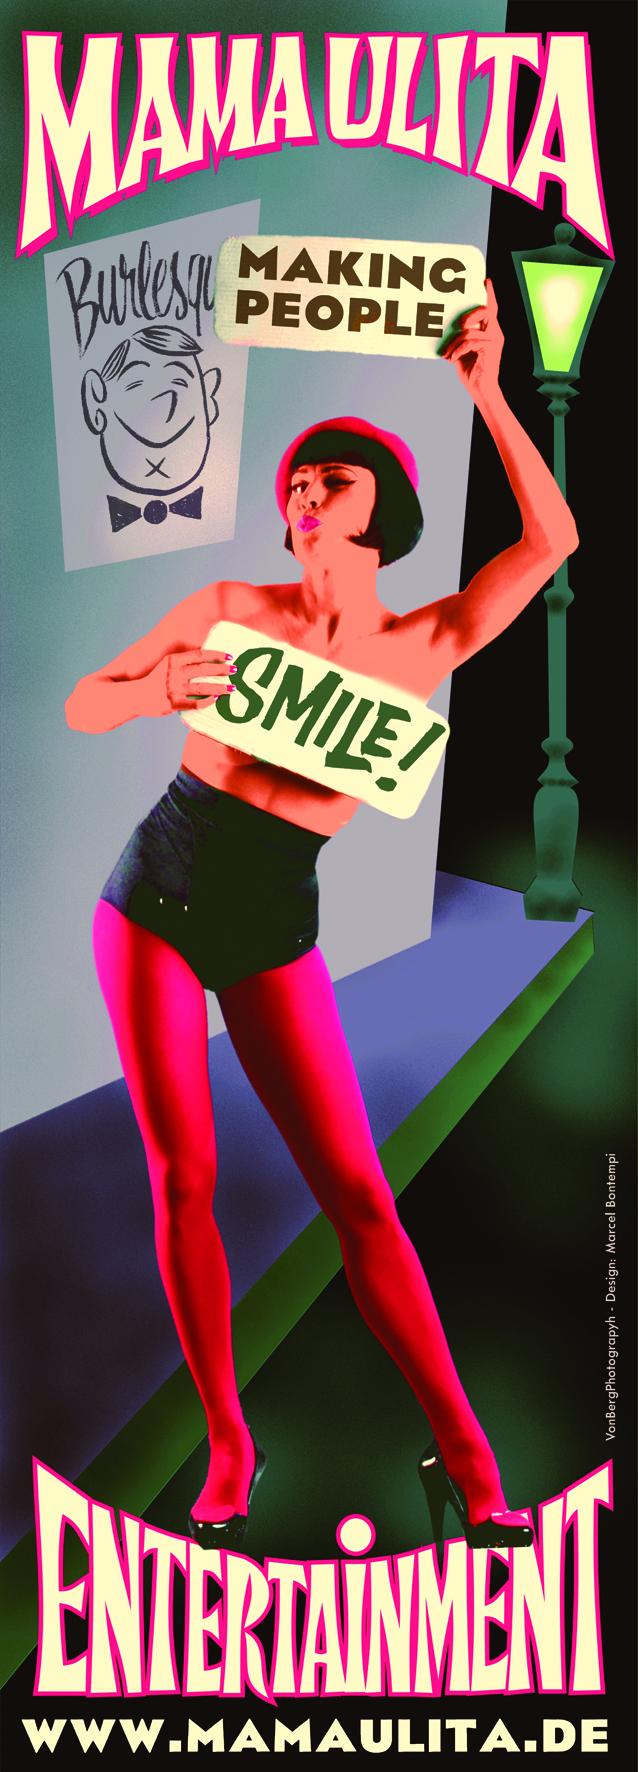 © Sticker ArtWork by Marcel Bontempi